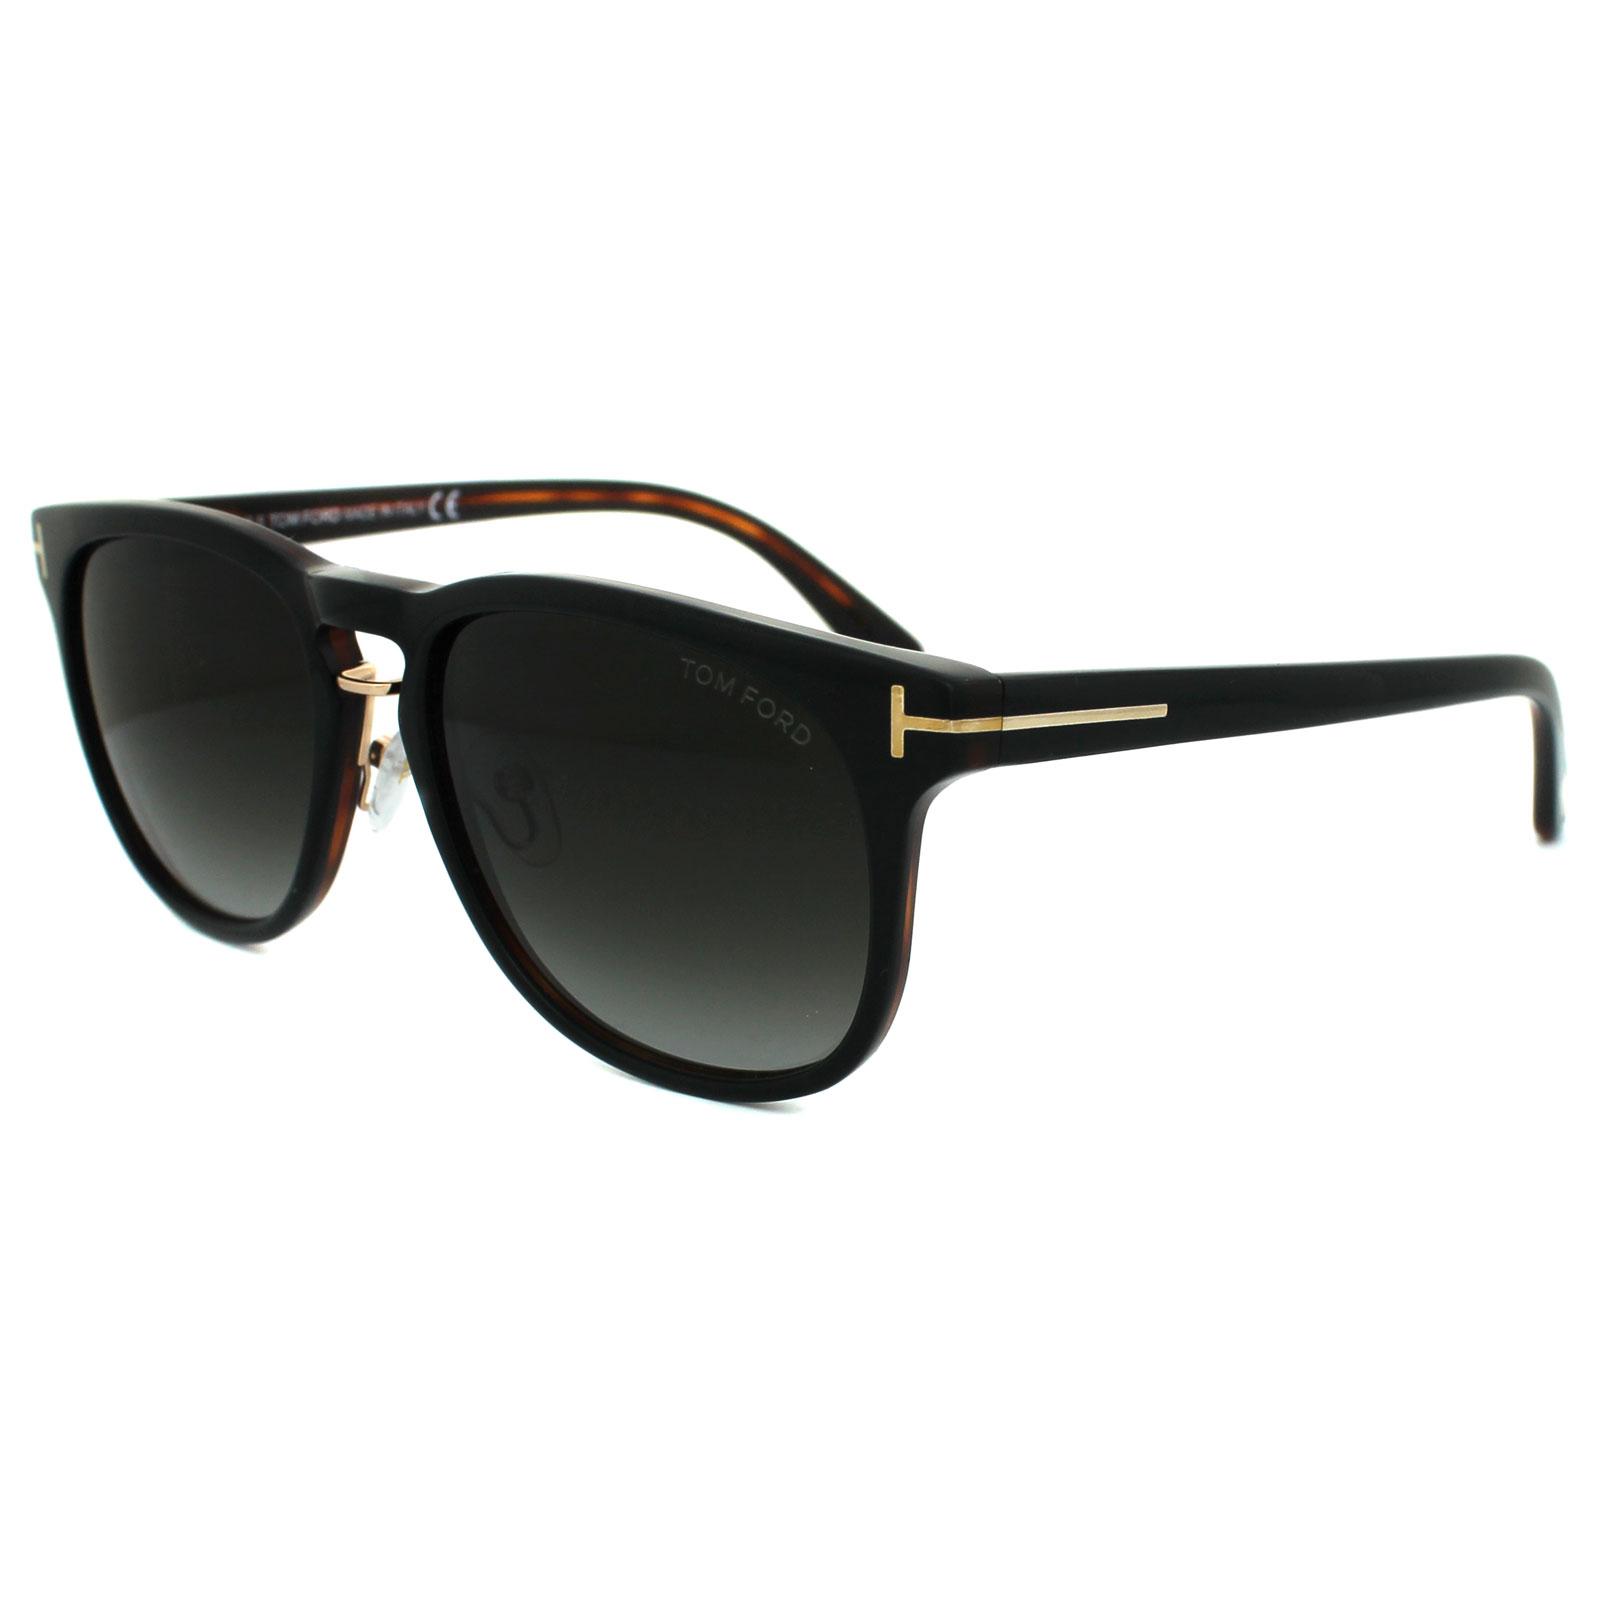 Cheap Tom Ford Sunglasses 0346 Franklin 01v Shiny Black